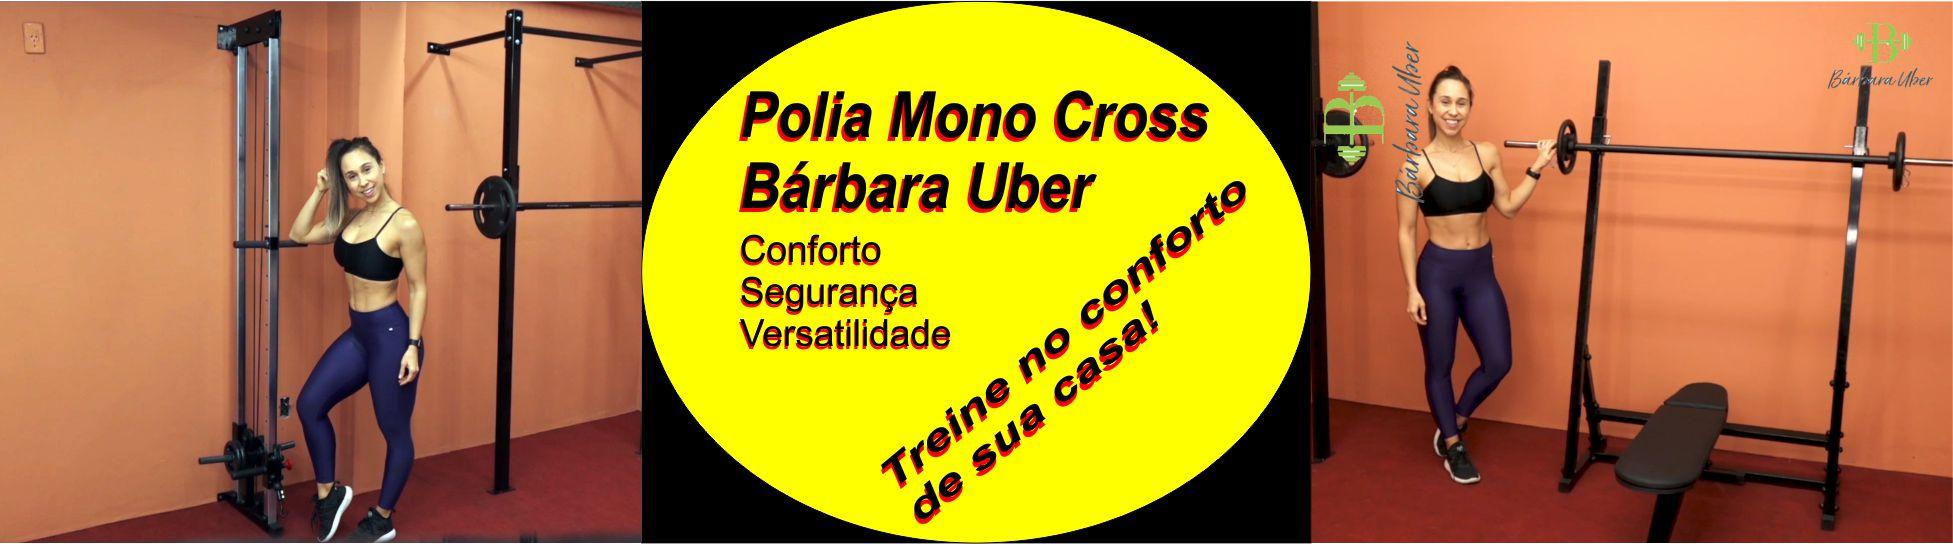 polia mono cross bárbara uber